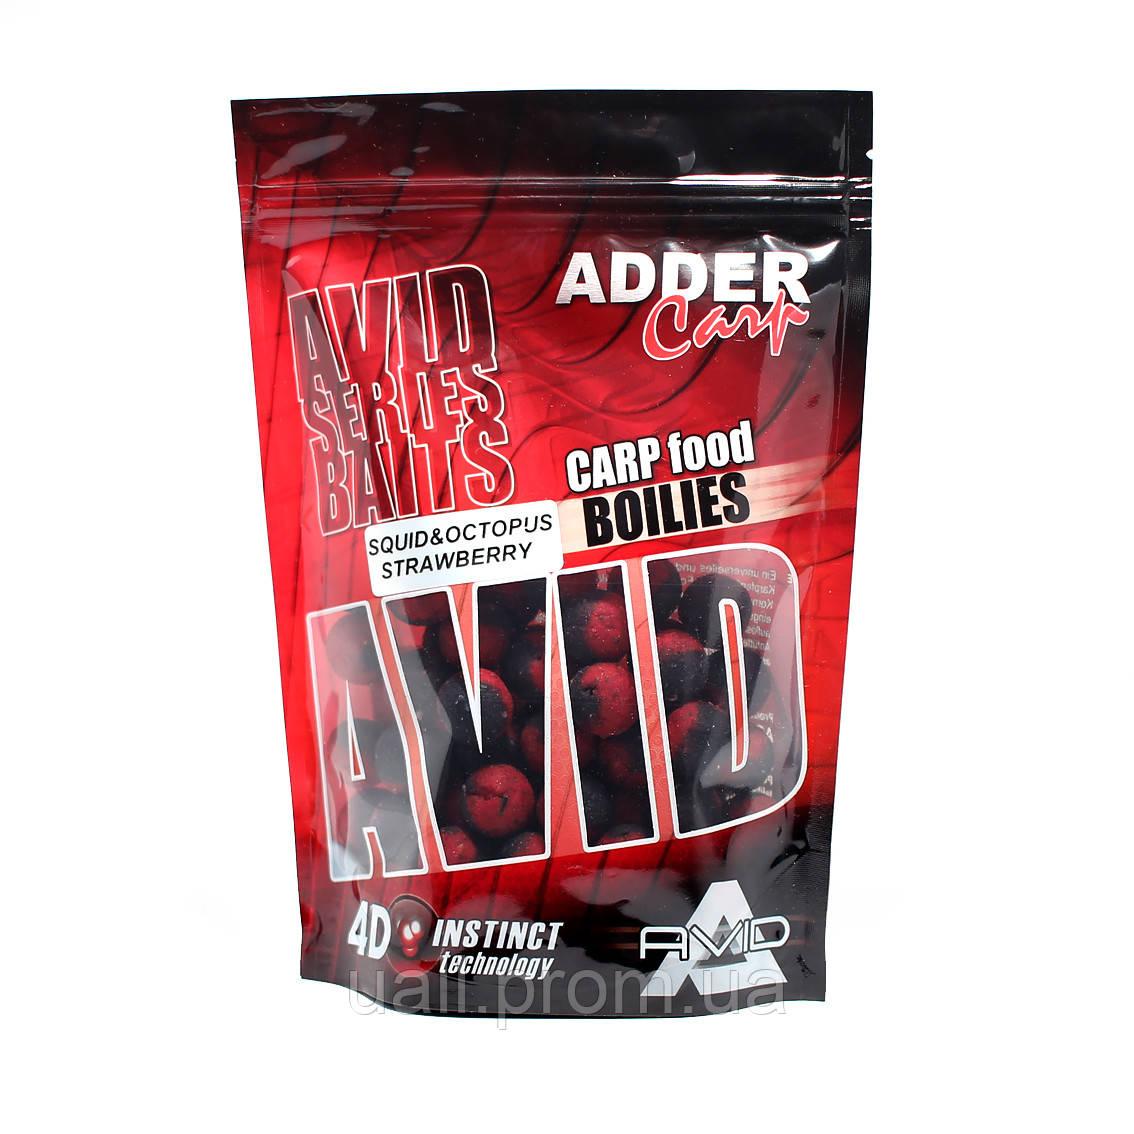 Бойли Adder Carp Boilies AVID Squid&Octopus-Strawberry 200g (16mm)(Кальмар Восьминіг Полуниця)